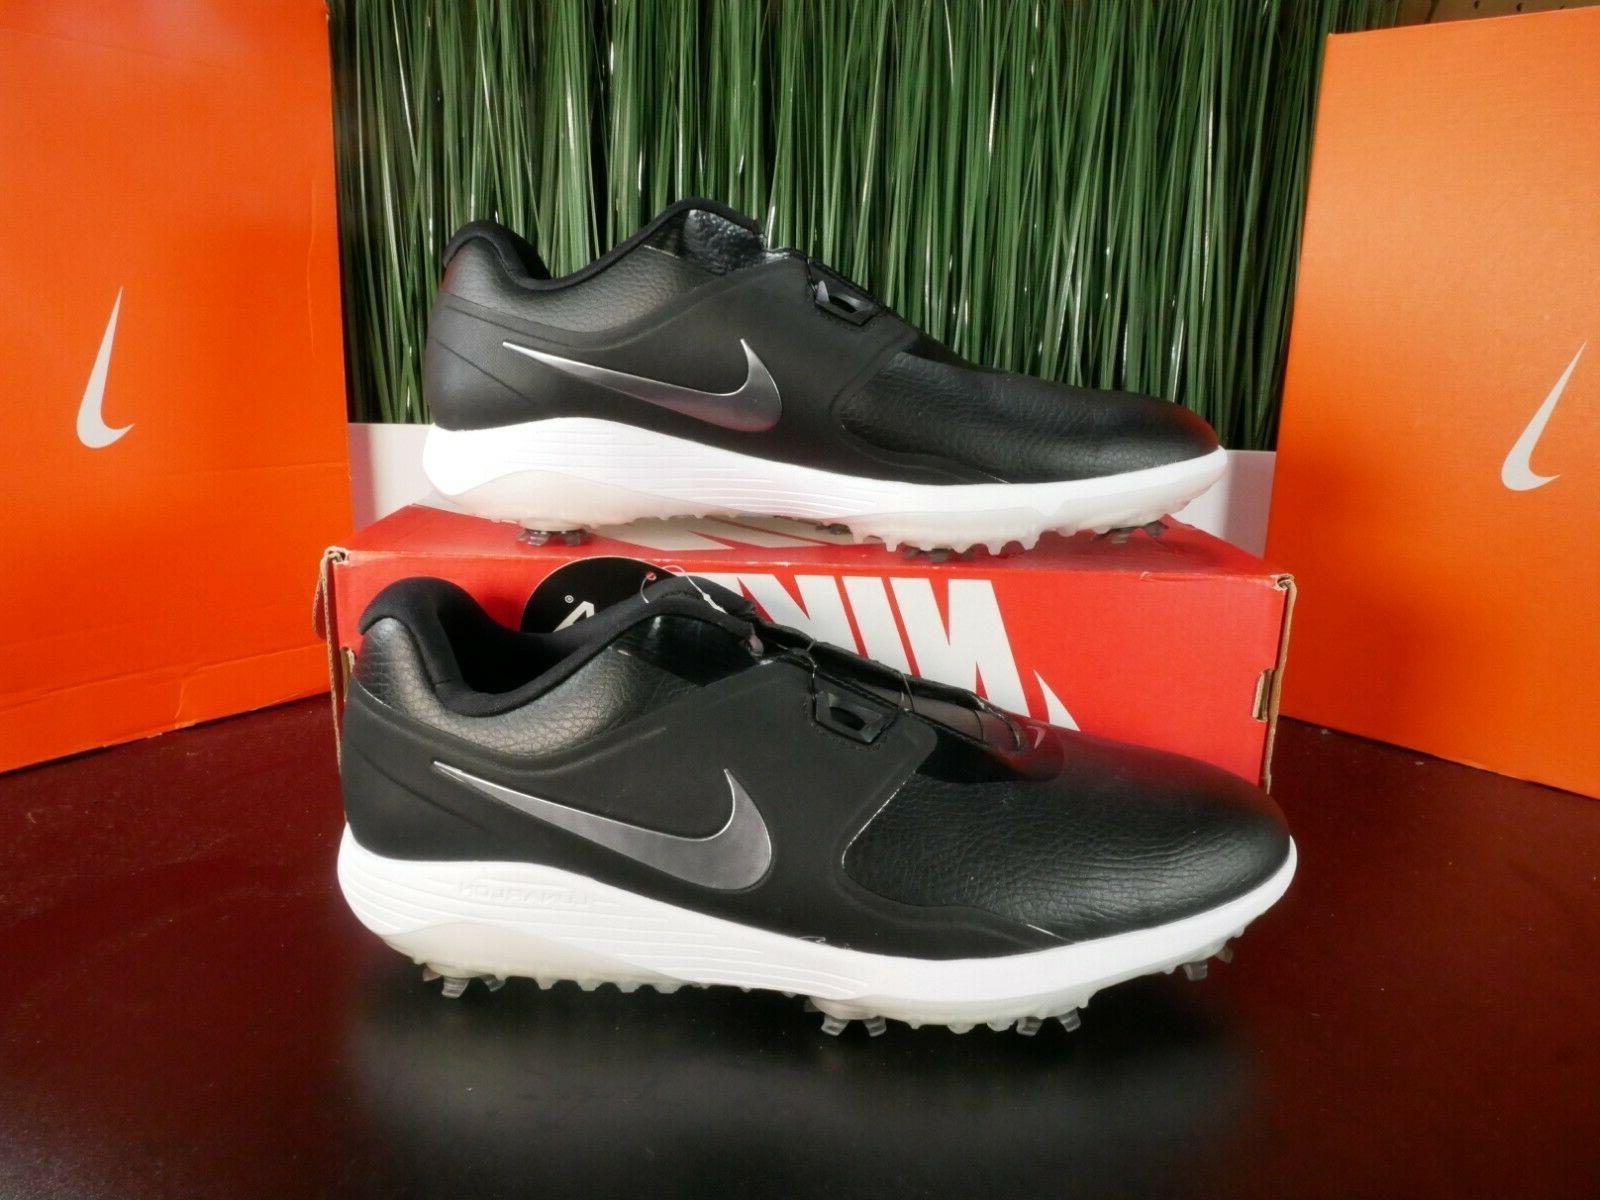 vapor pro boa mens golf shoes black